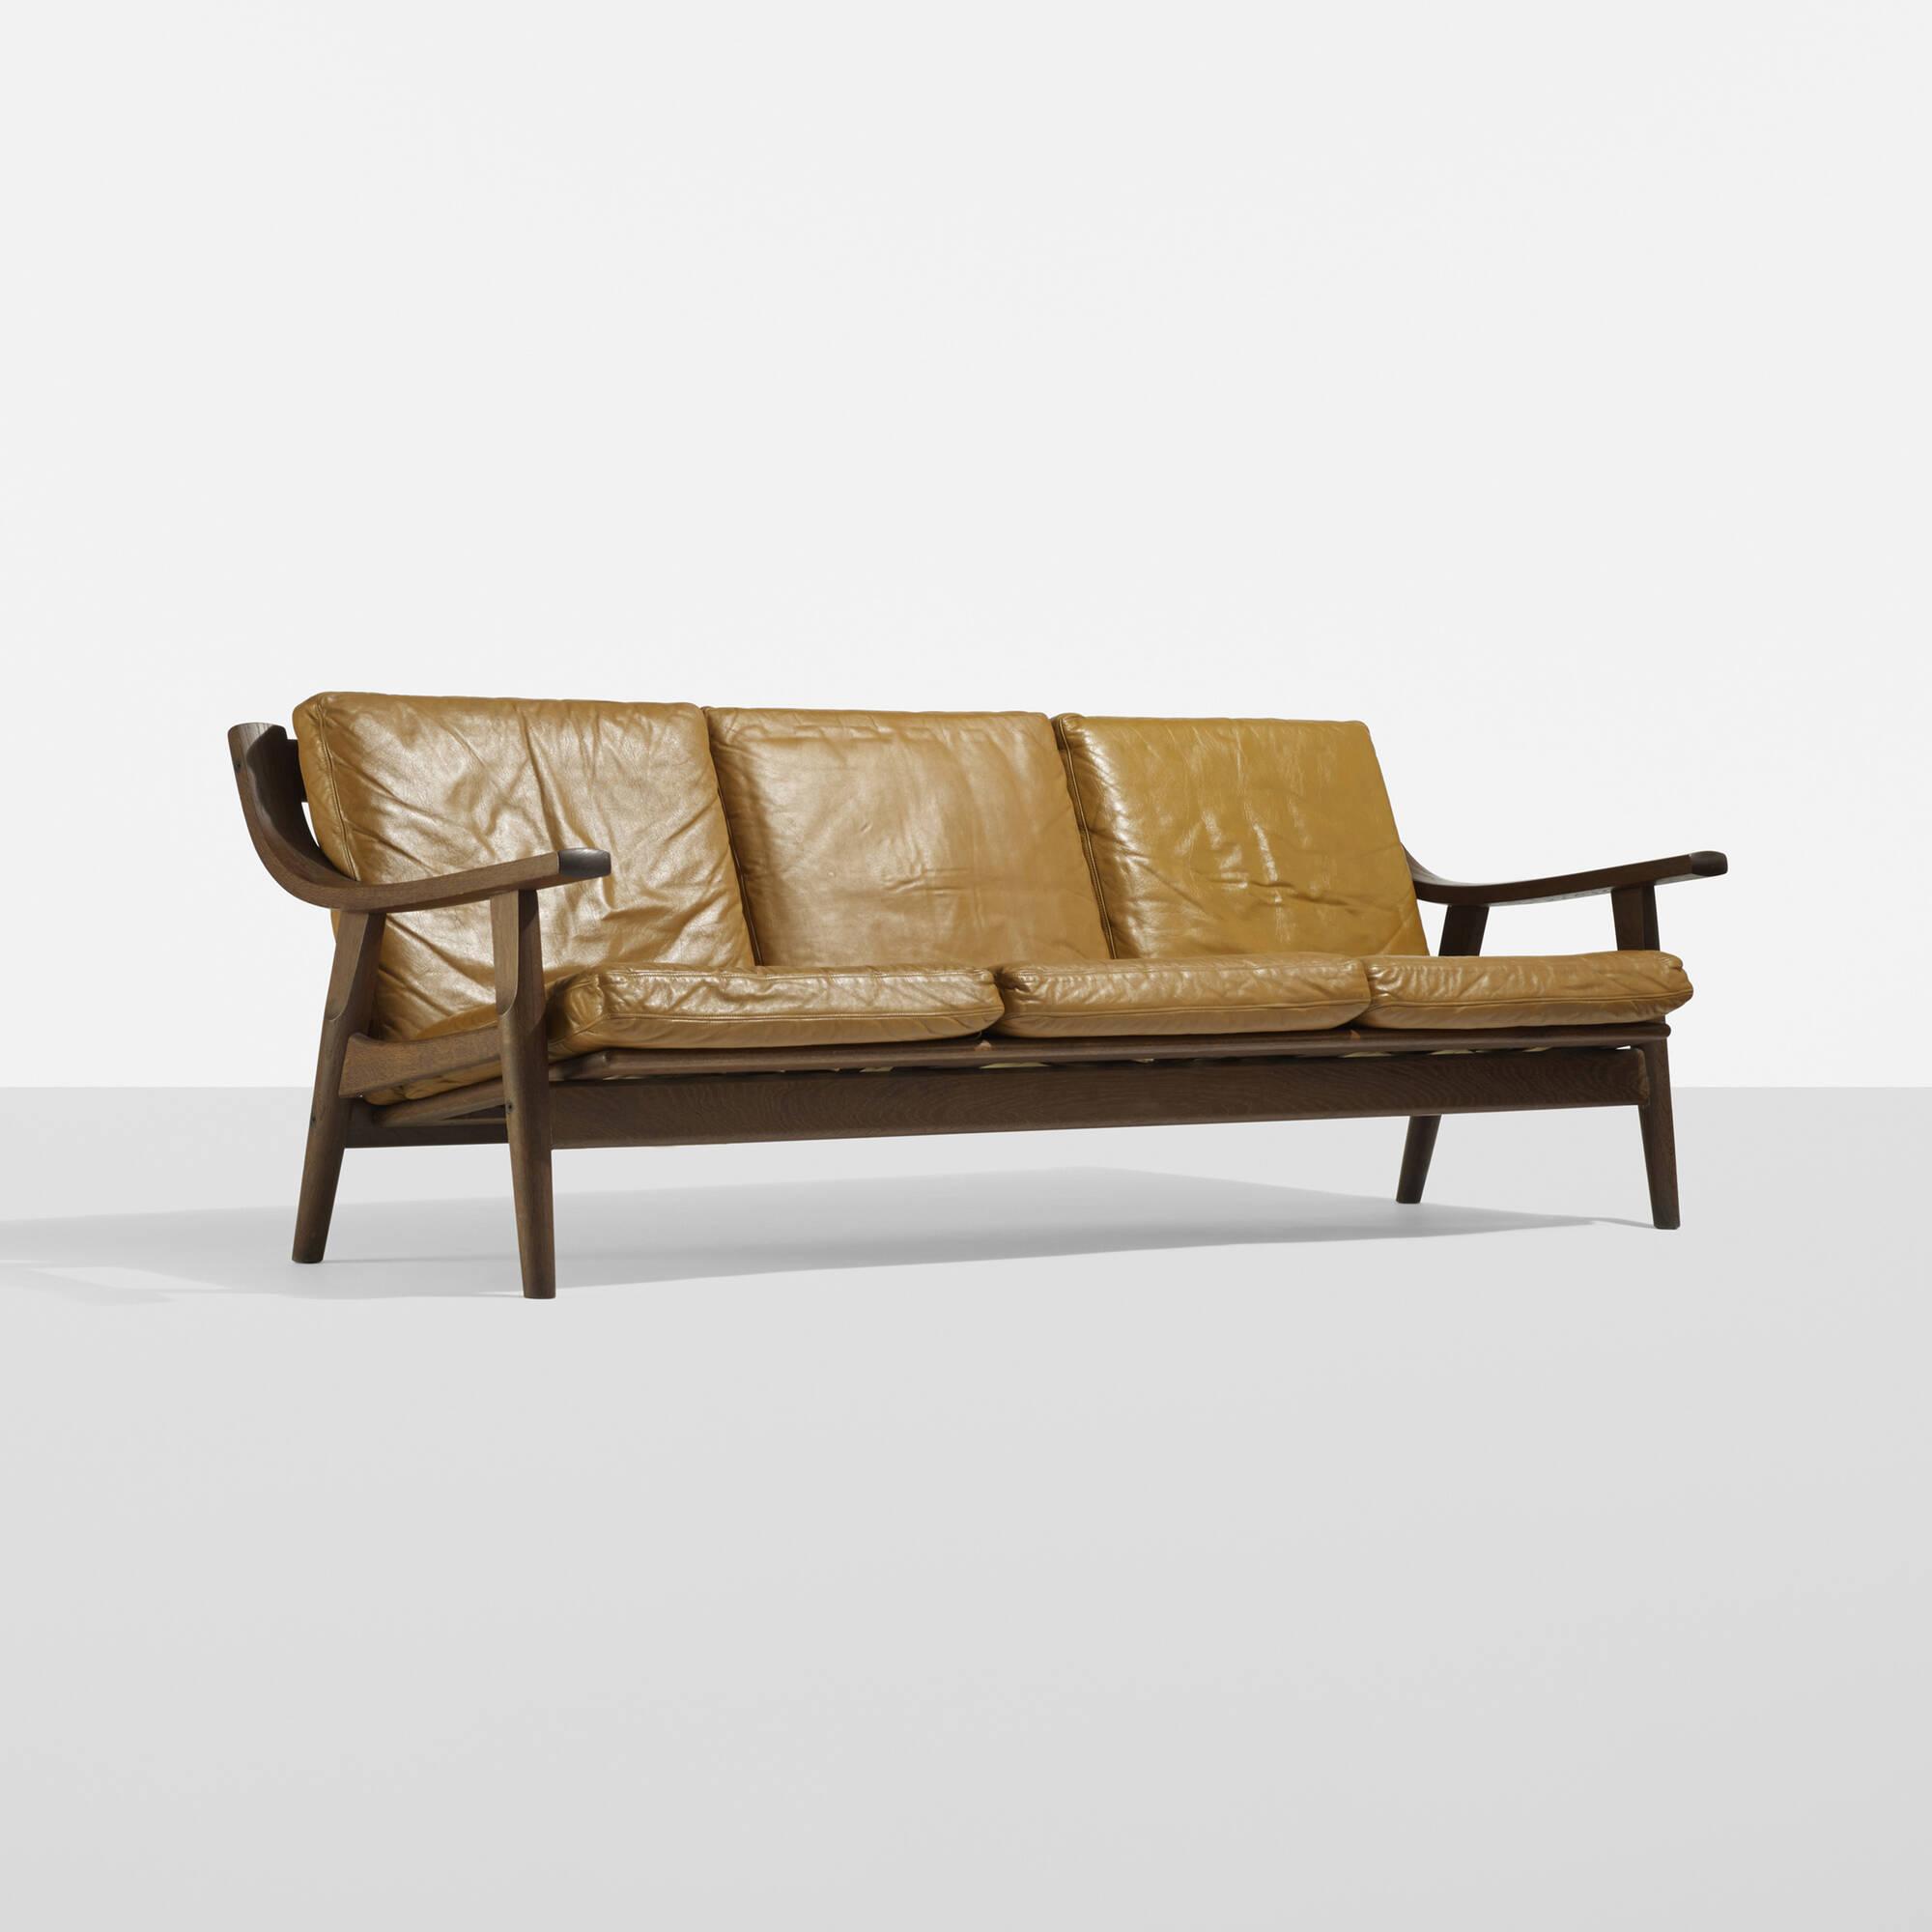 296 Hans J Wegner sofa Scandinavian Design 20 November 2014